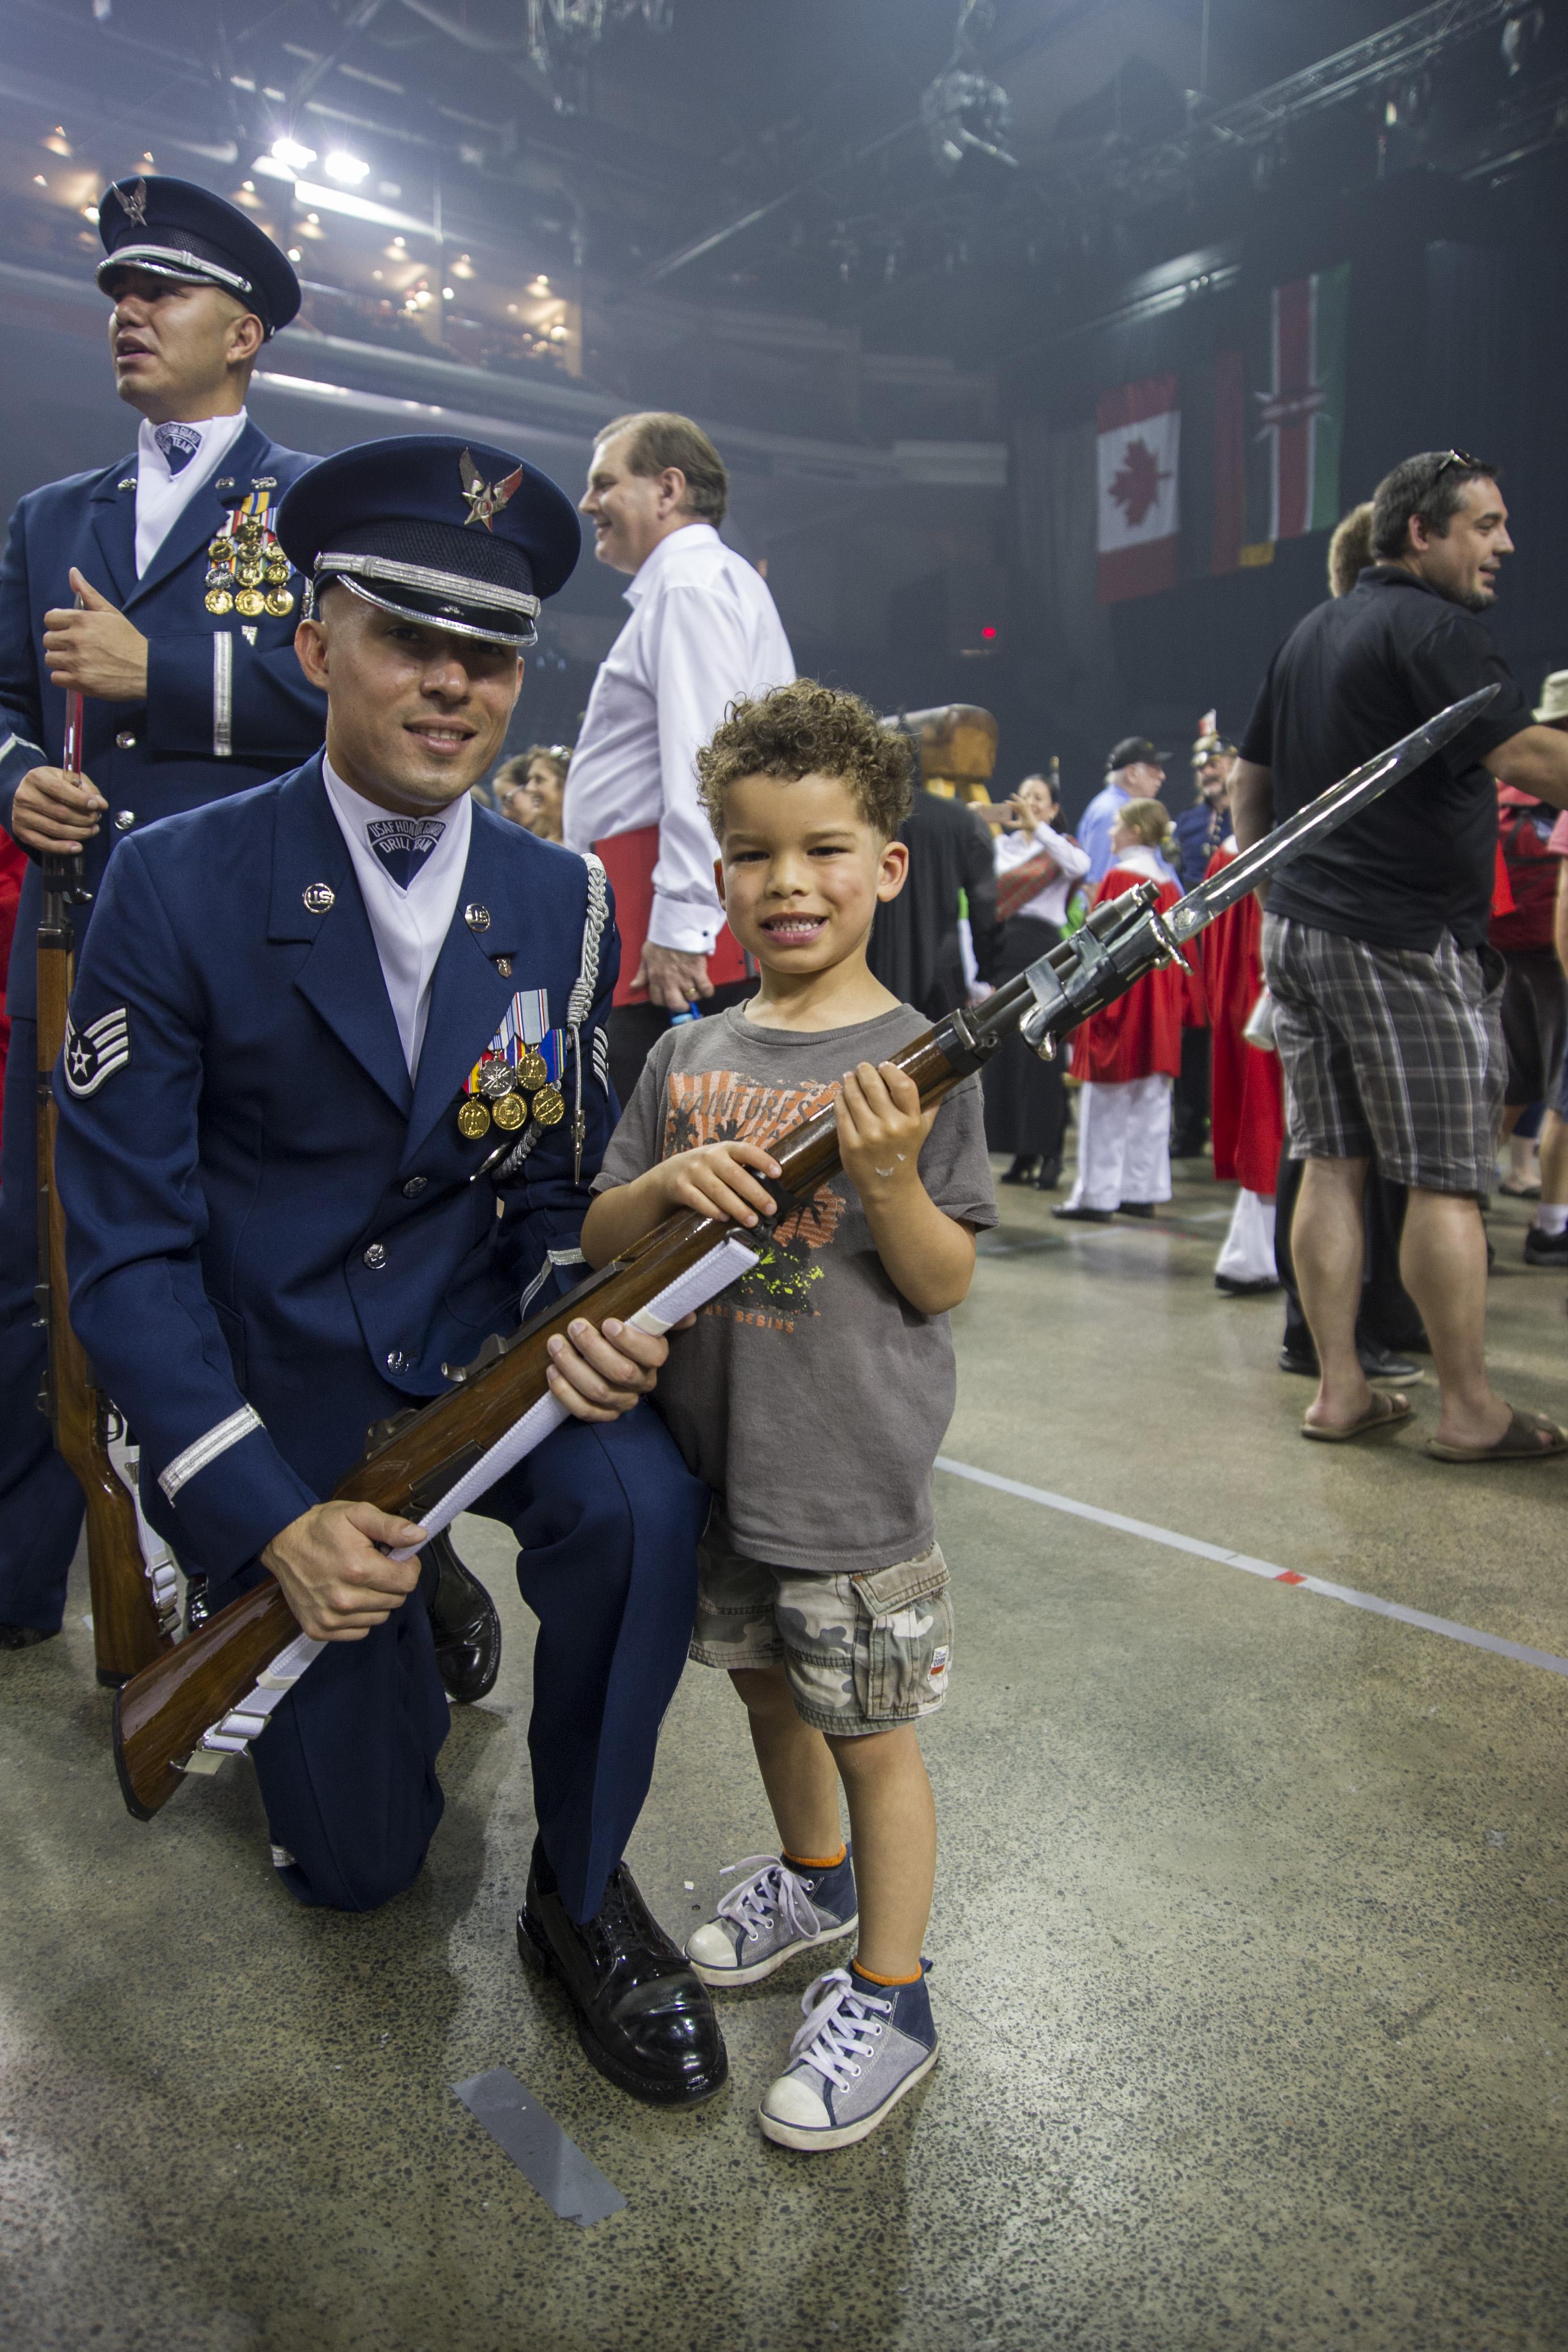 USAF Honor Guard concludes Nova Scotia performances